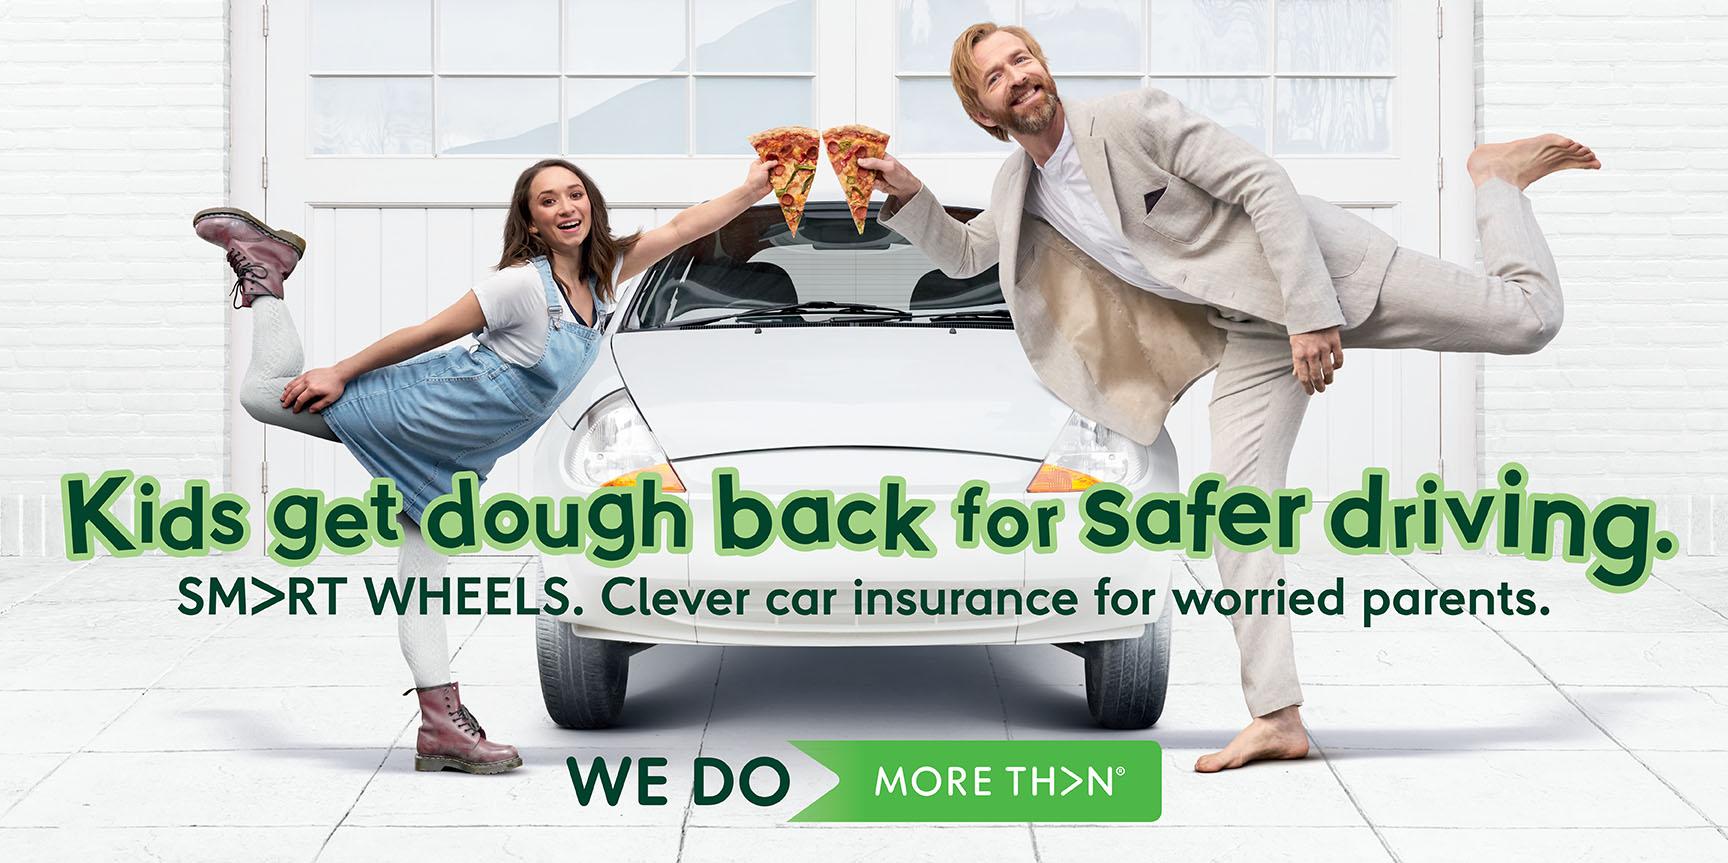 More Than Car Insurance